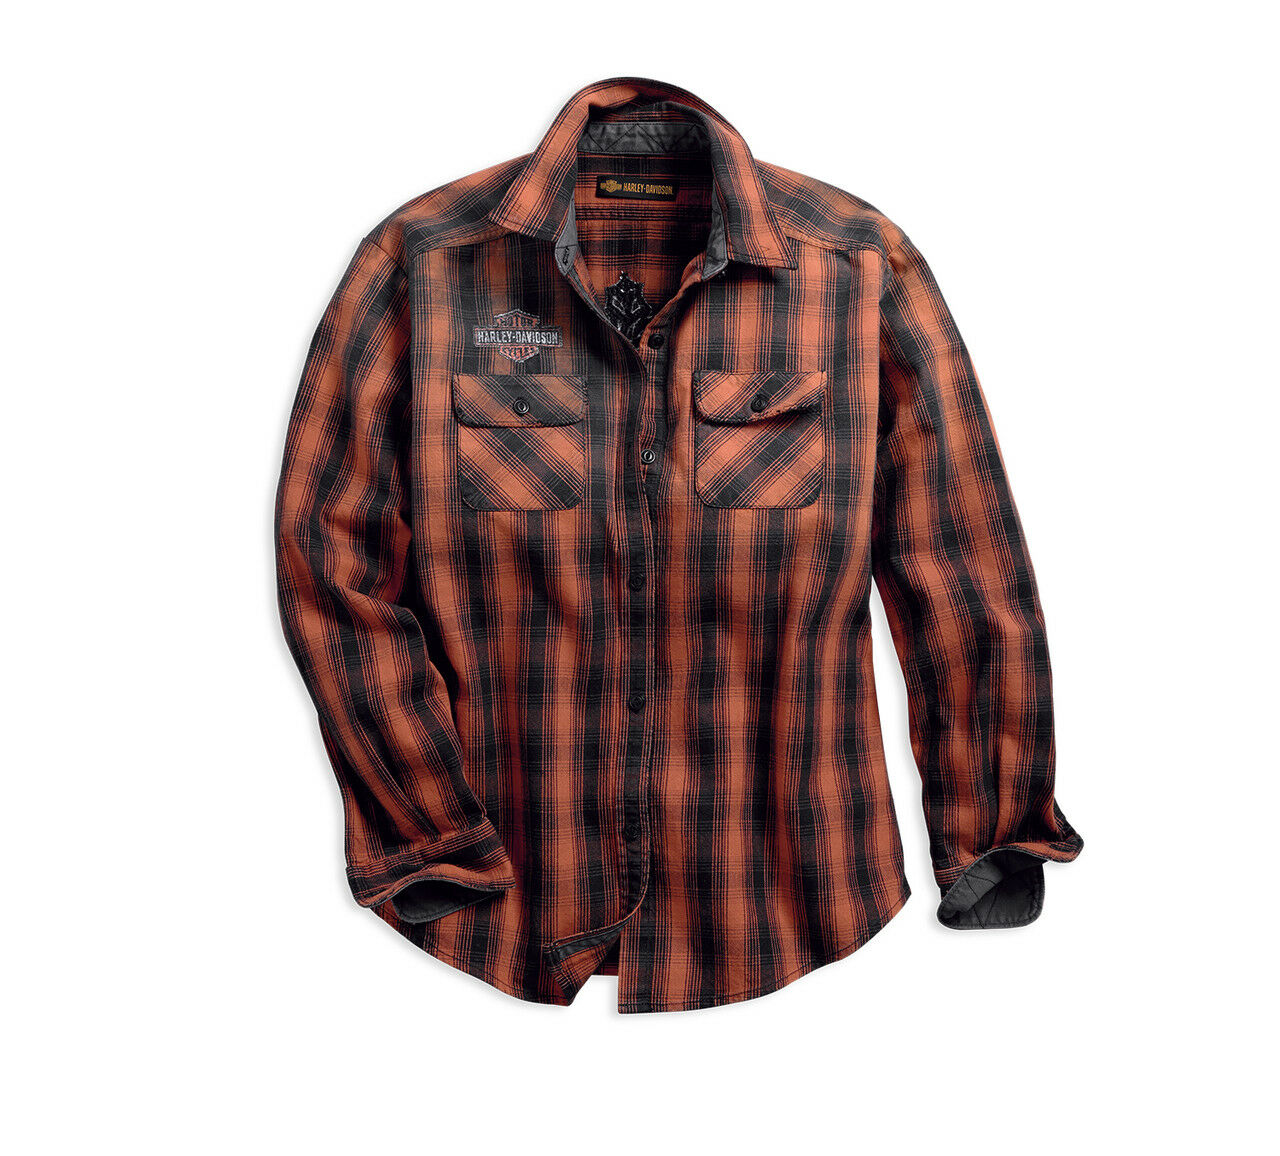 Harley-Davidson® Woherren Oak Leaf Plaid Flannel Relaxed Fit Shirt - XL